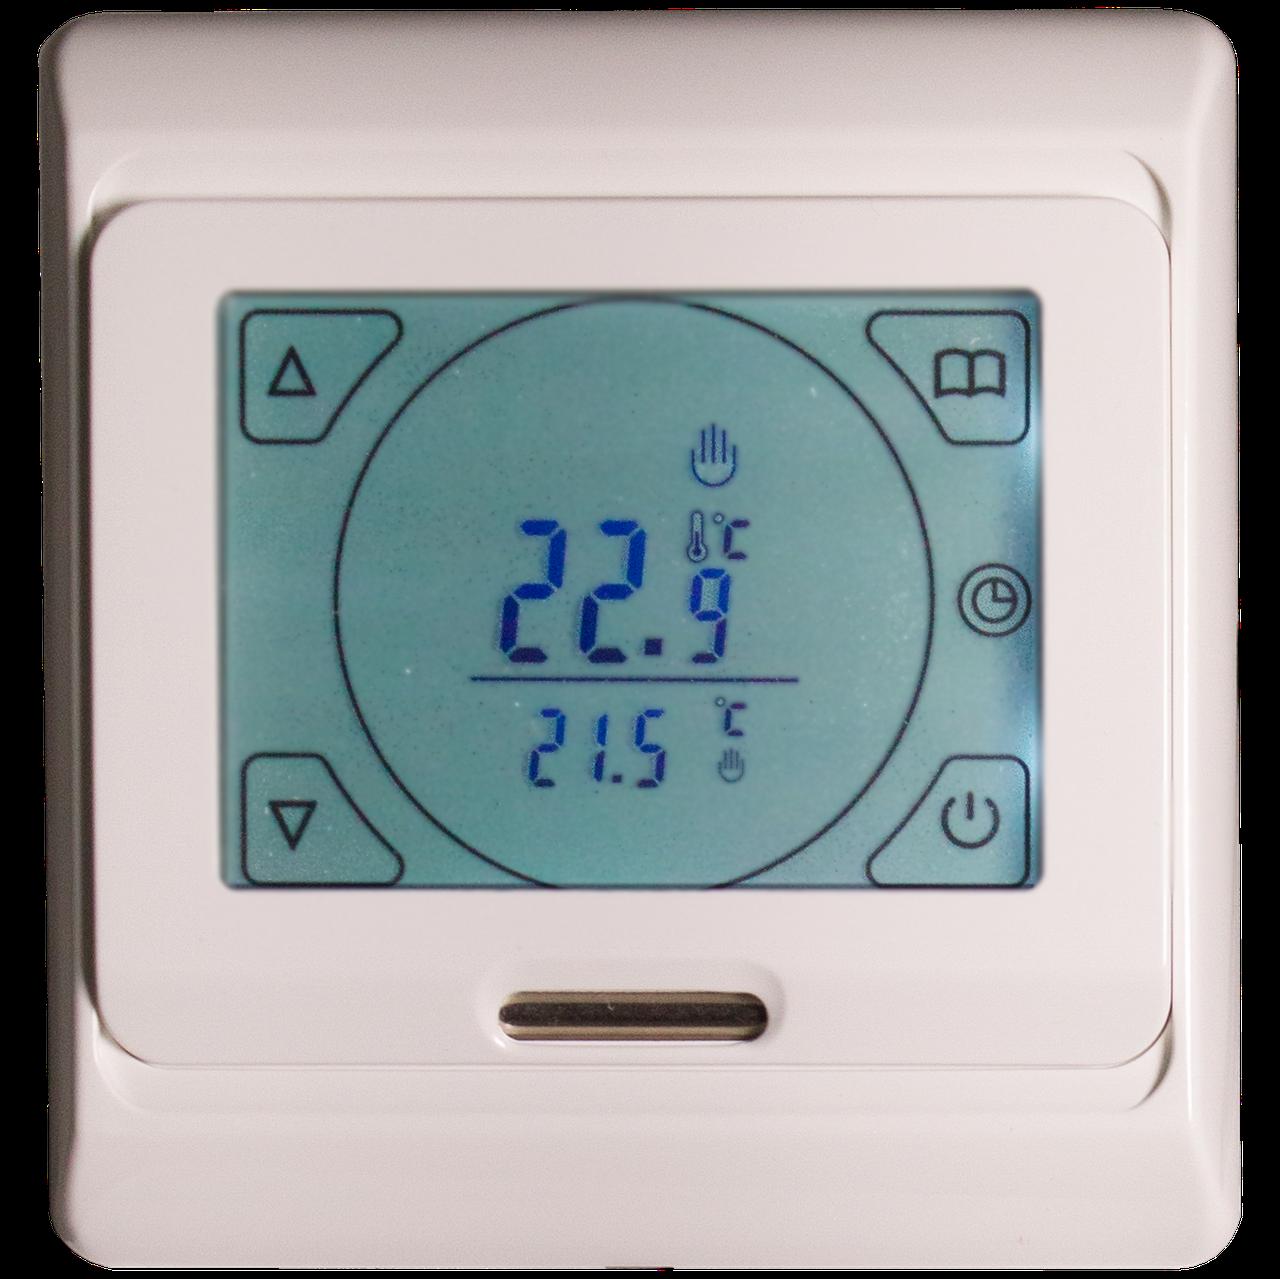 Терморегулятор для теплого пола: 115 фото инструкций по подбору устйроства